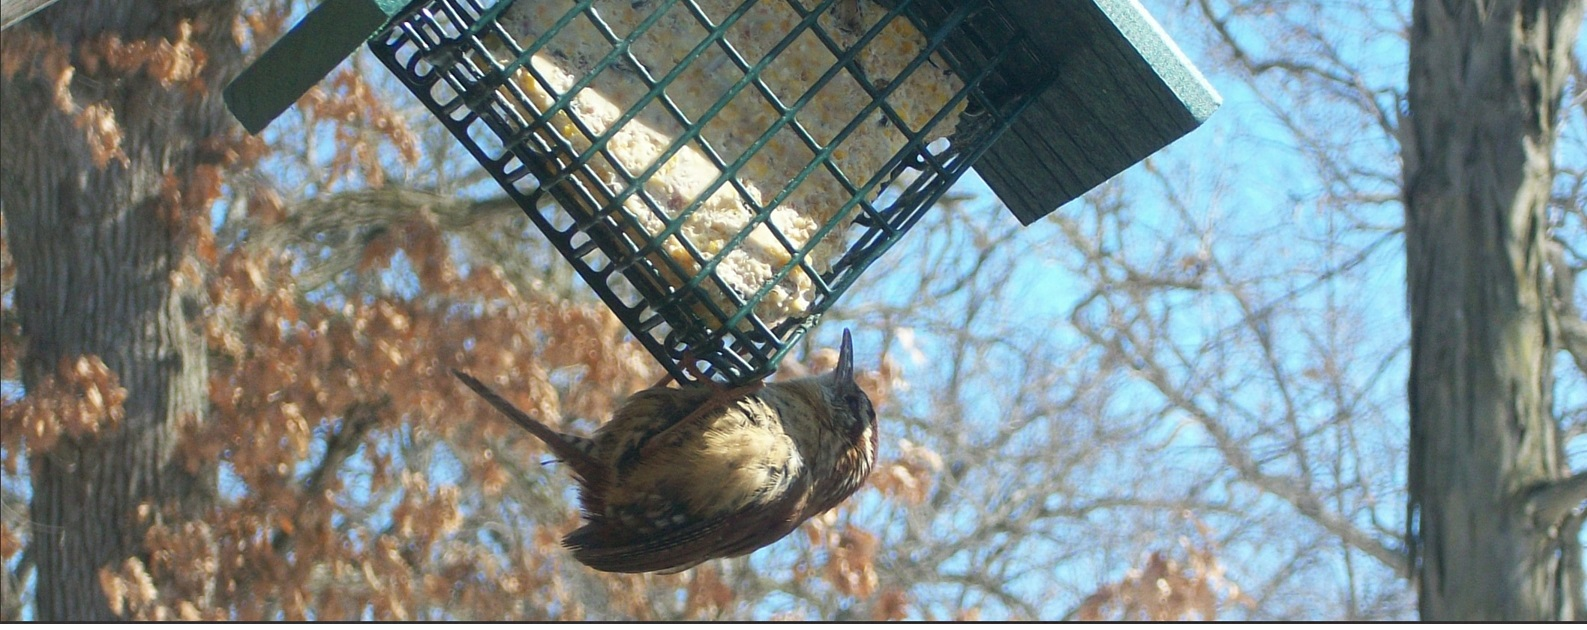 great backyard bird count scott county iowa